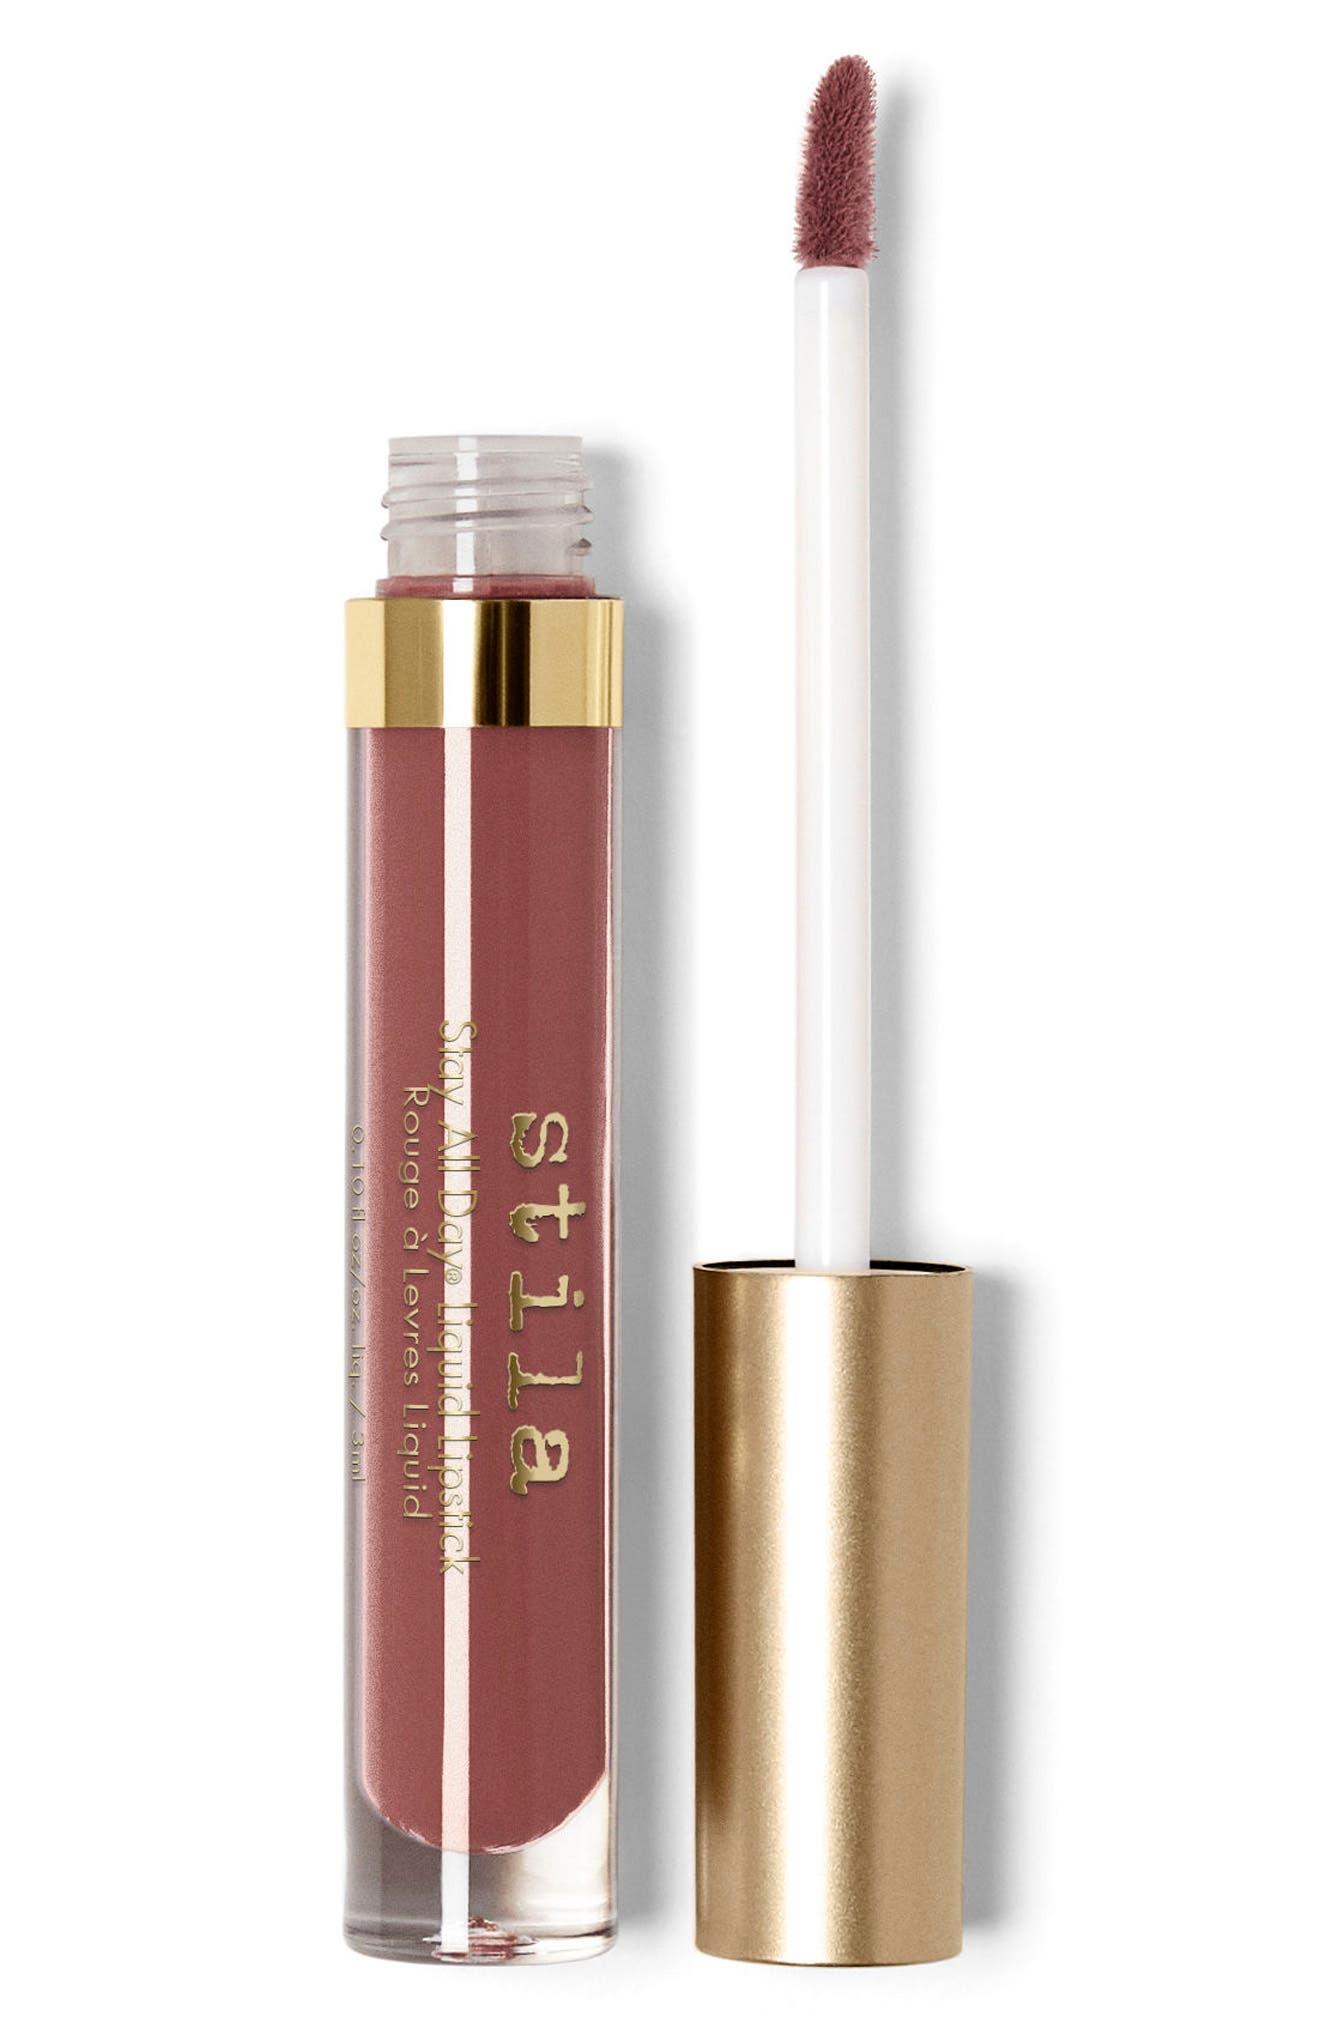 Stila Stay All Day® Sheer Liquid Lipstick